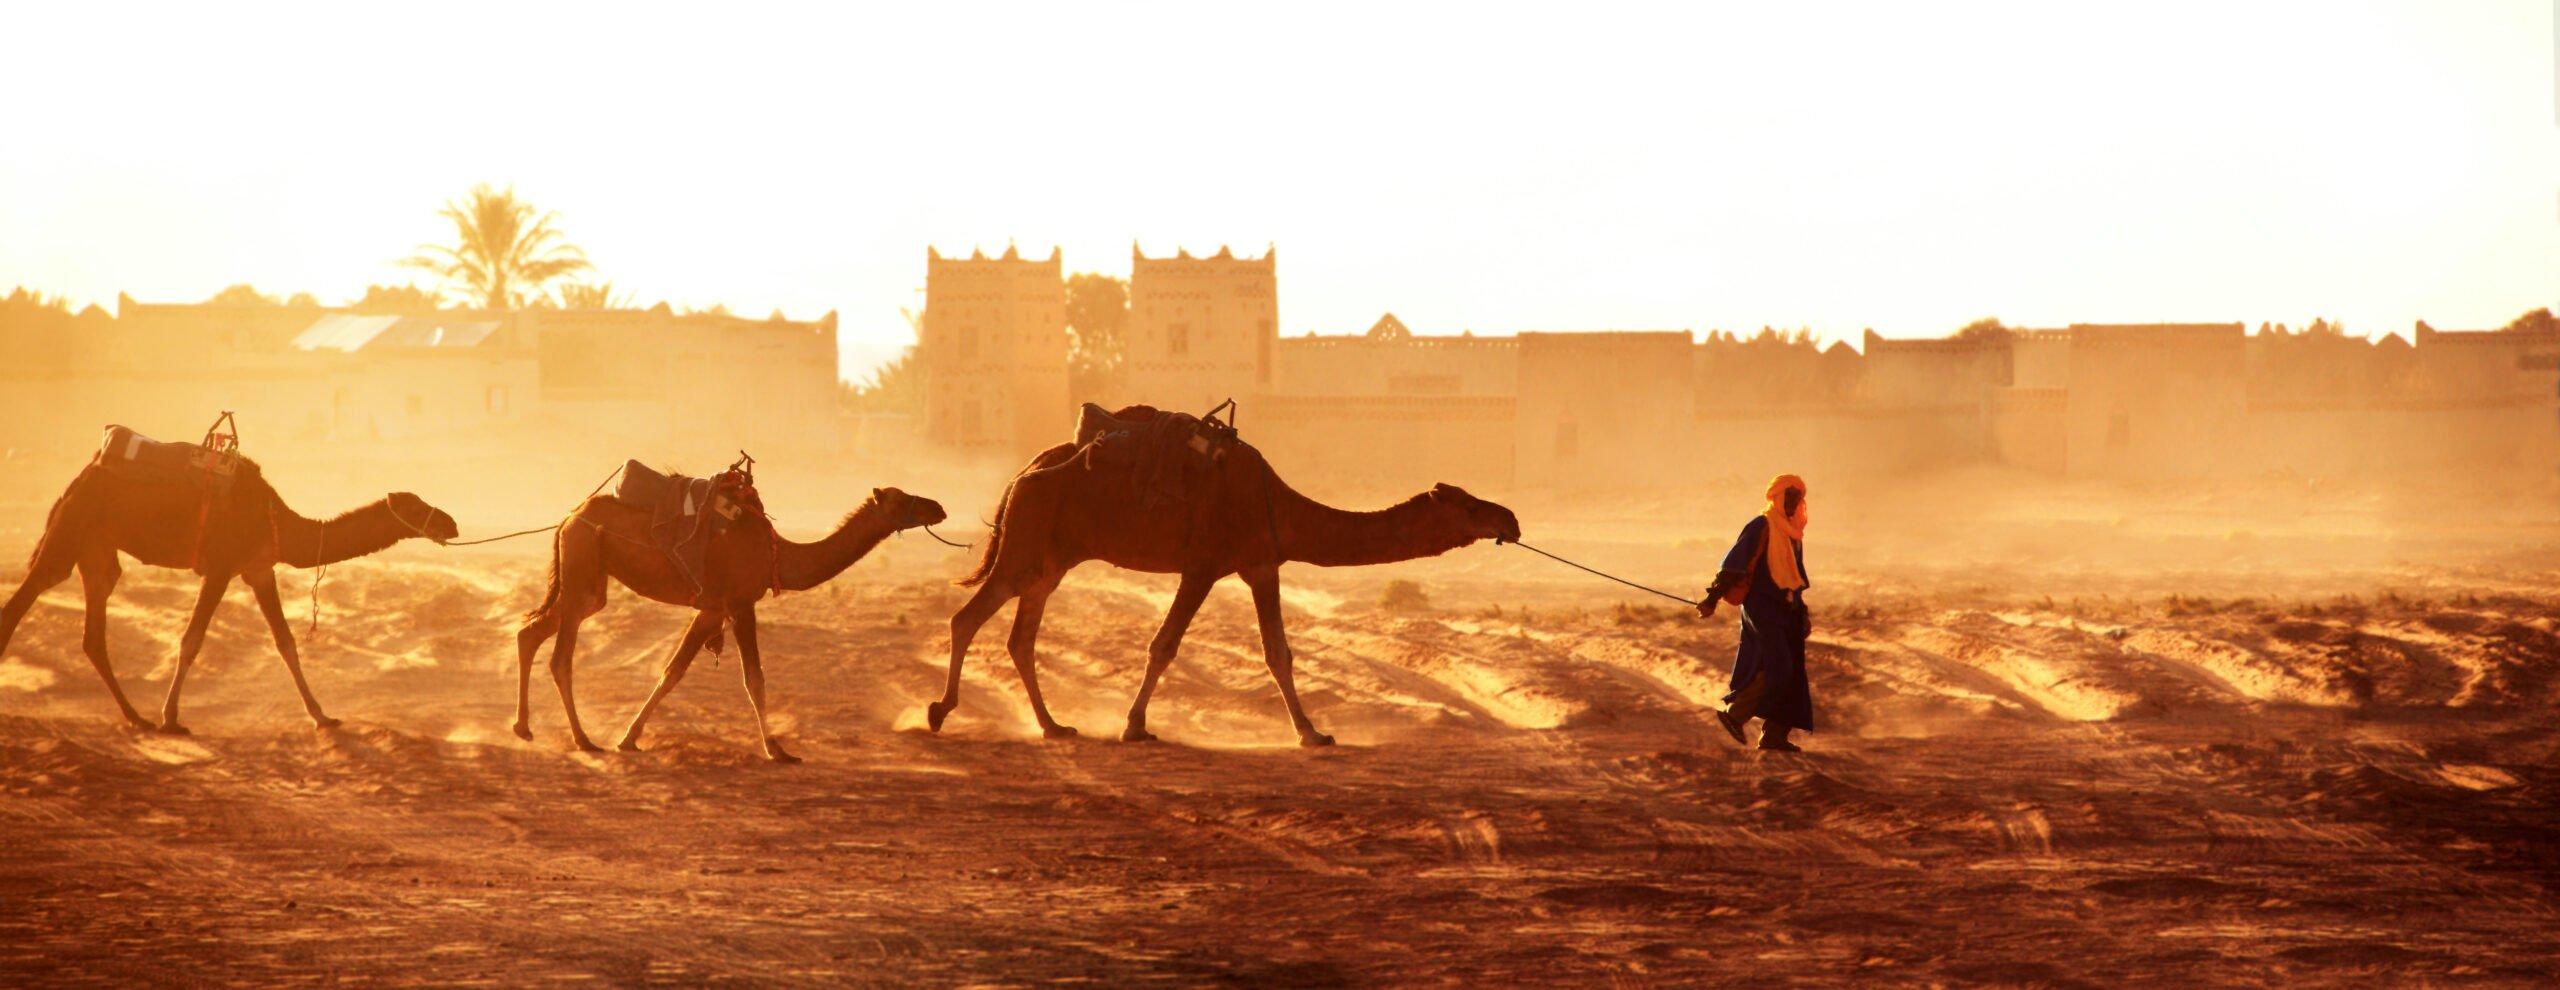 Culture Guide To Morocco